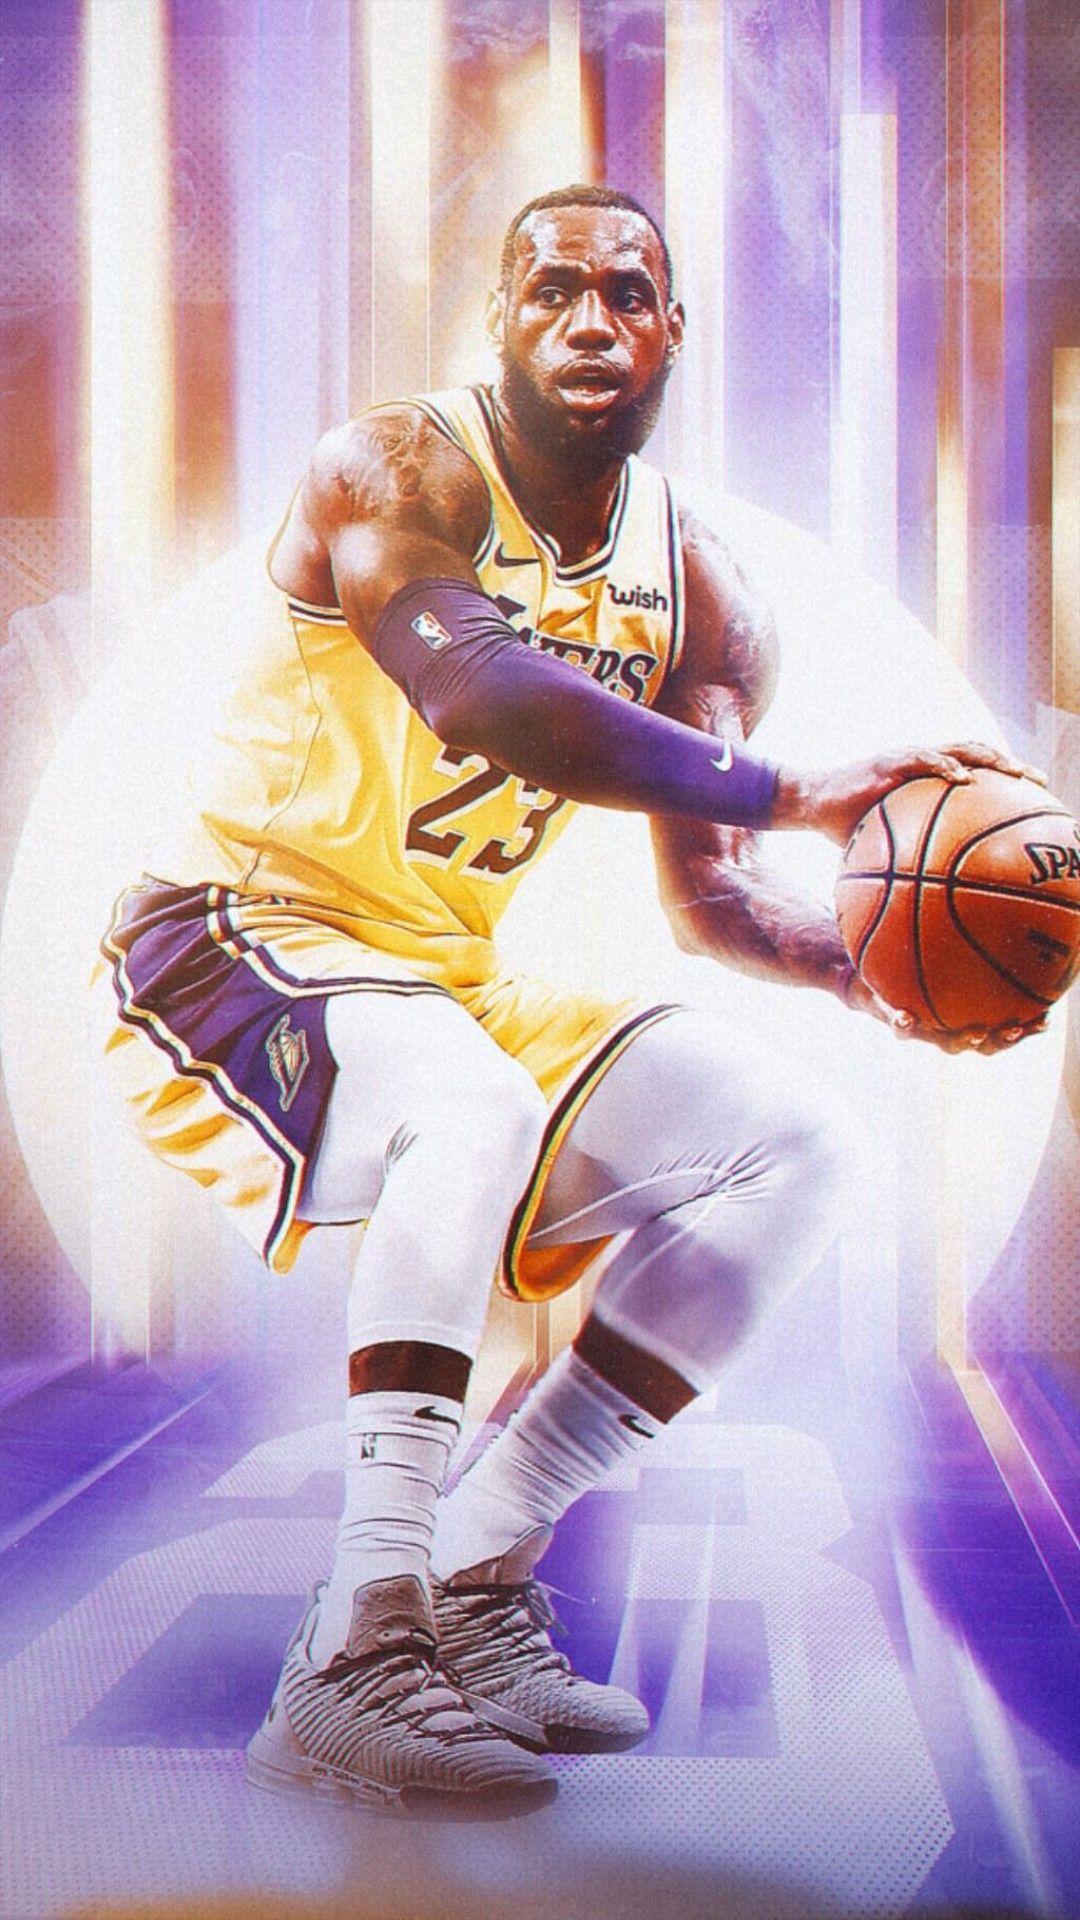 LeBron James LA Lakers wallpaper Lebron james lakers Lebron 1080x1920